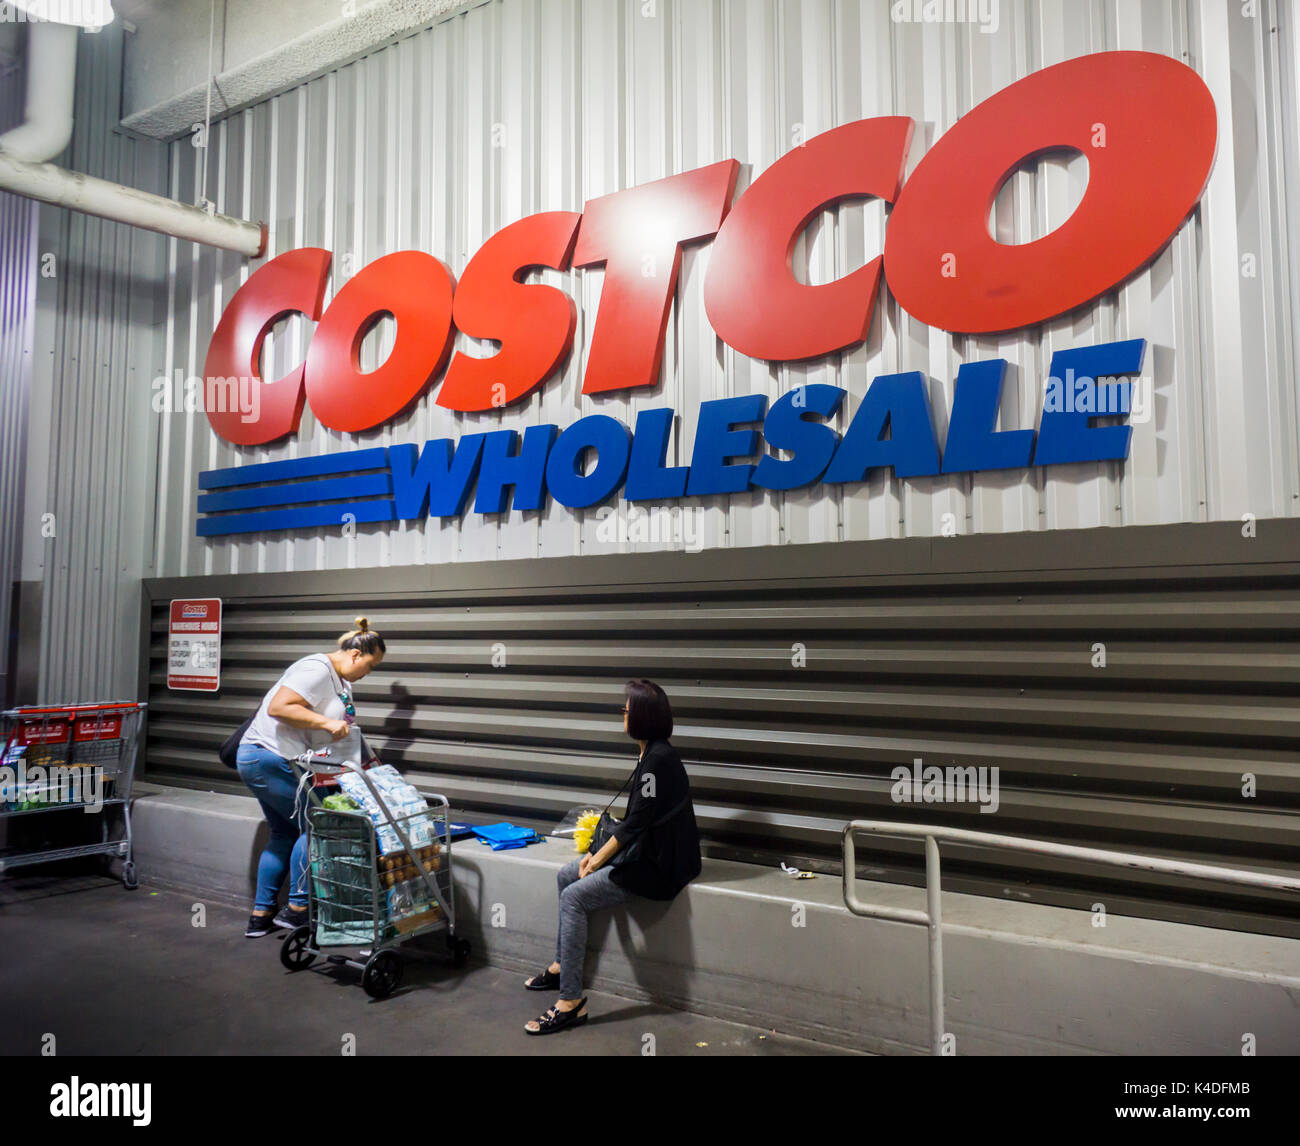 Costco Usa Stock Photos & Costco Usa Stock Images